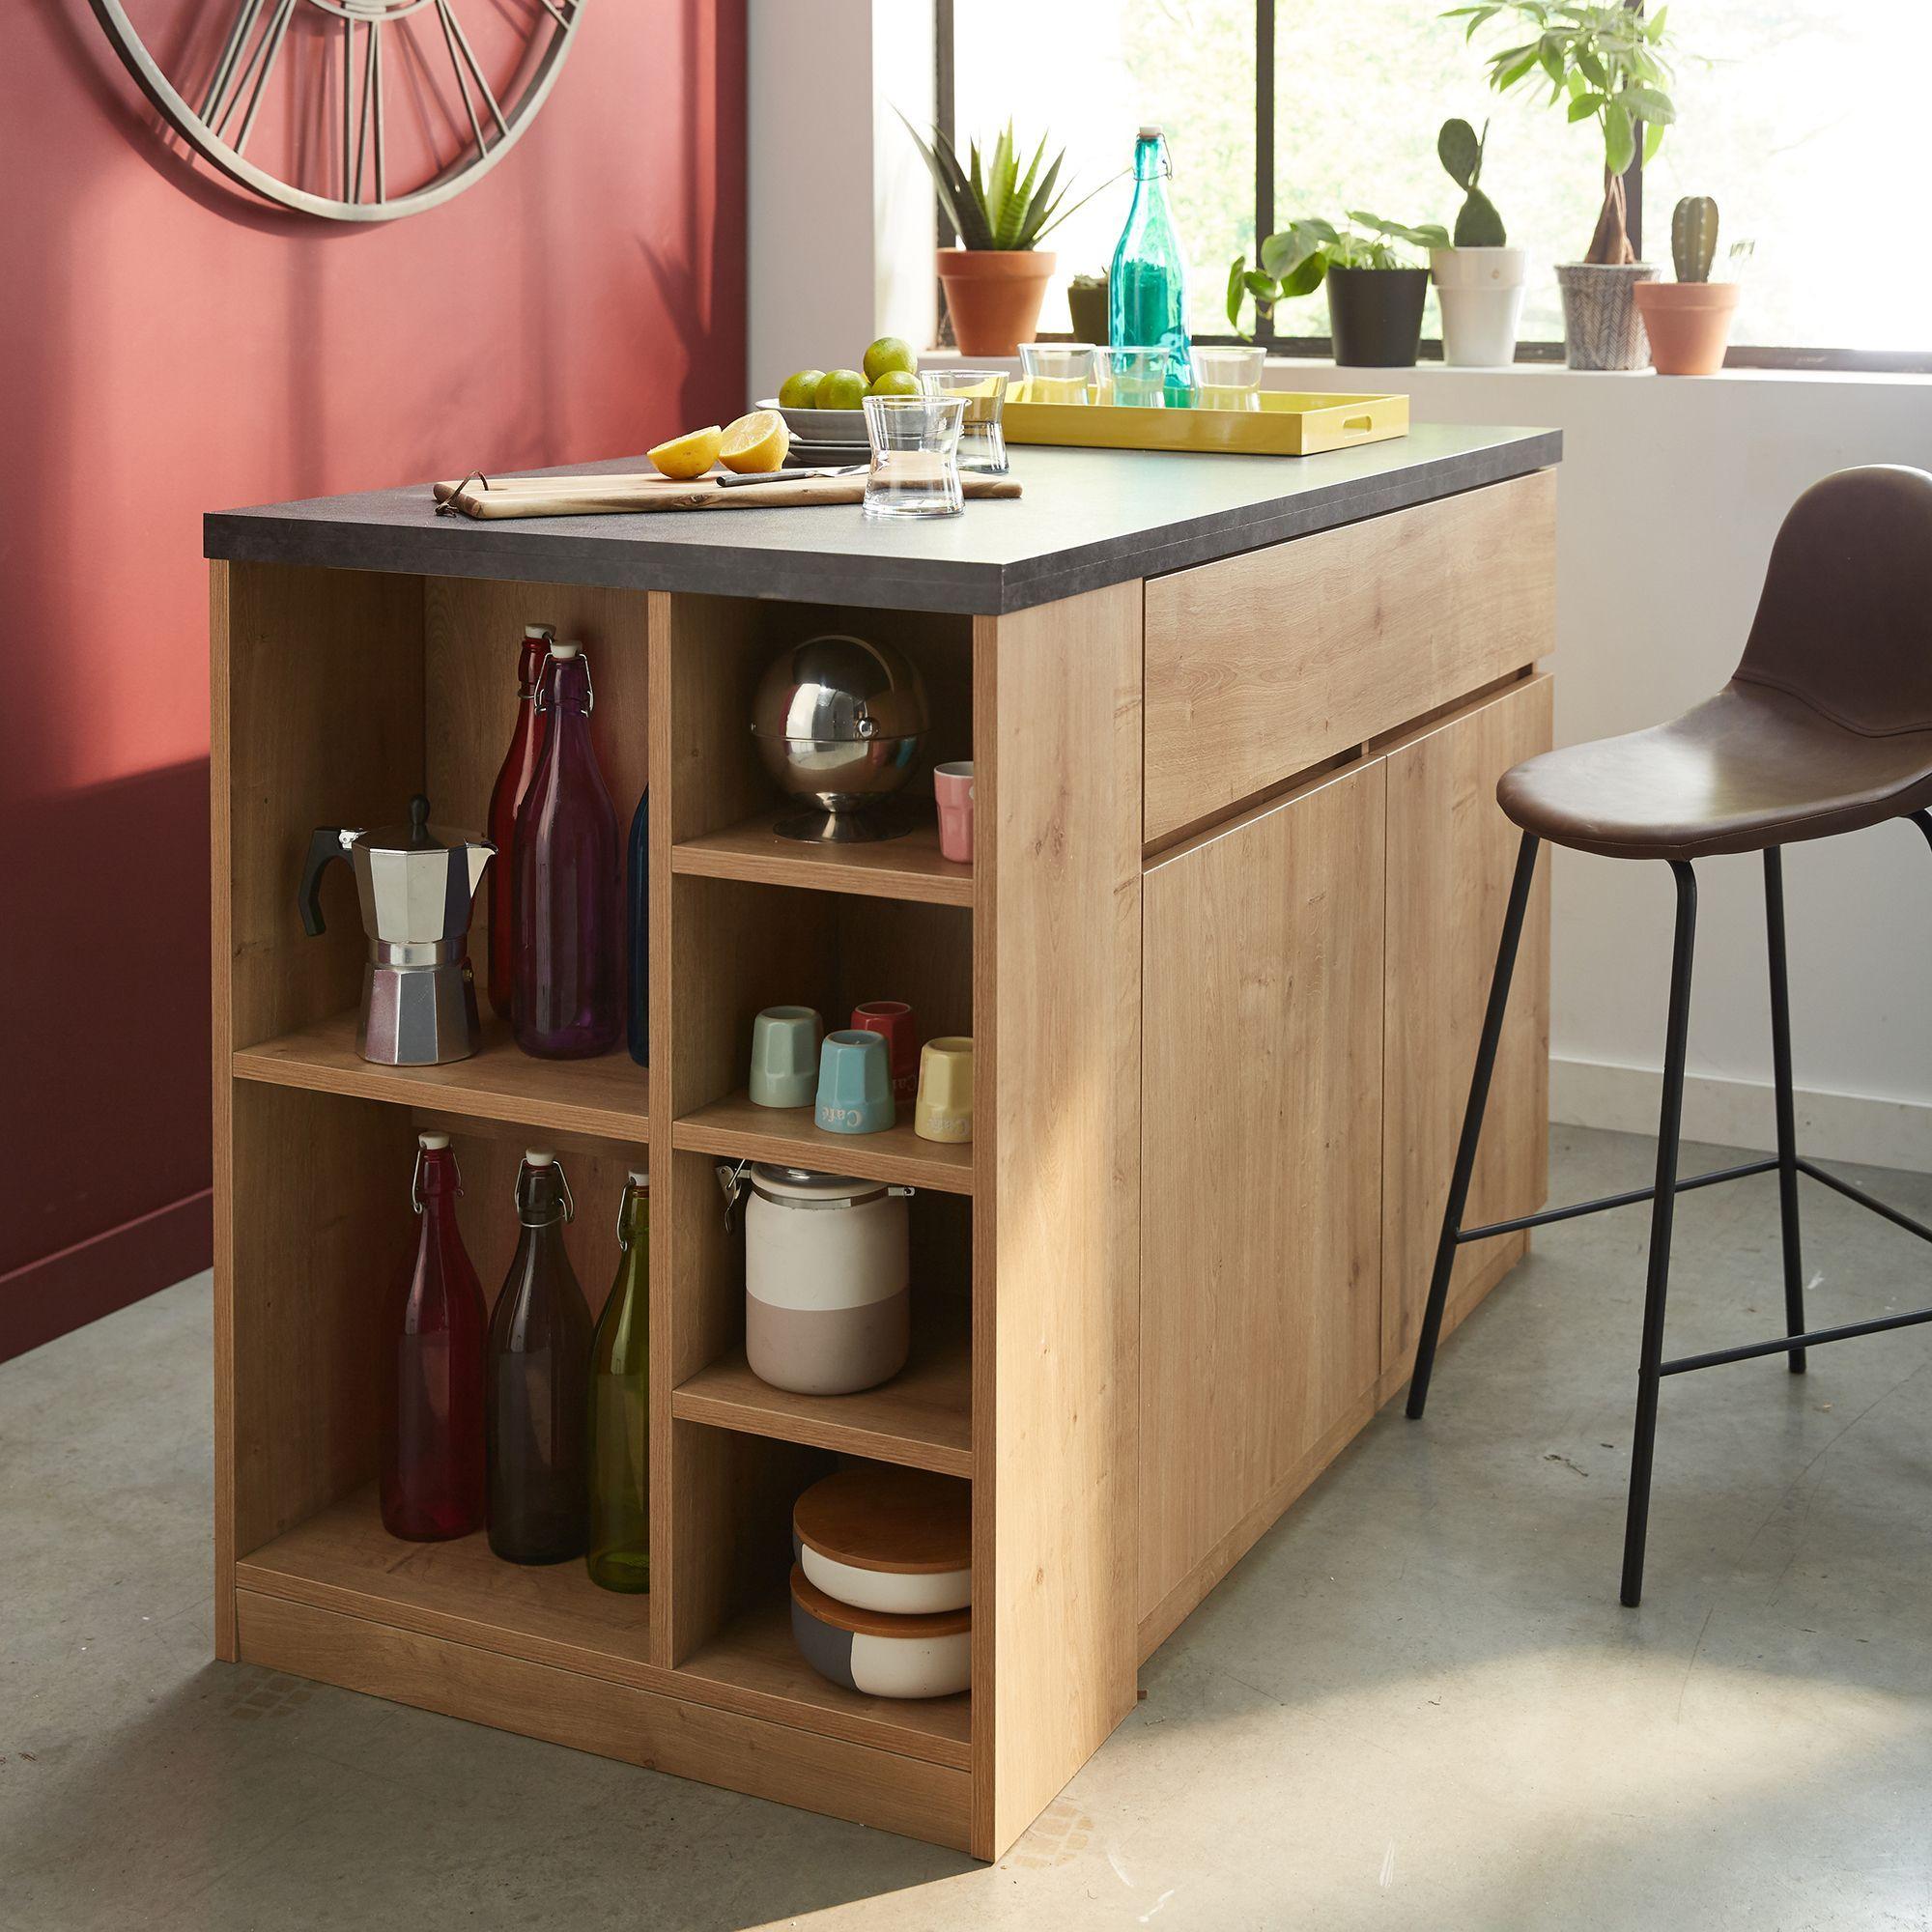 alinea gabin bar lot central l140cm rangement r versible alin a moi pinterest. Black Bedroom Furniture Sets. Home Design Ideas